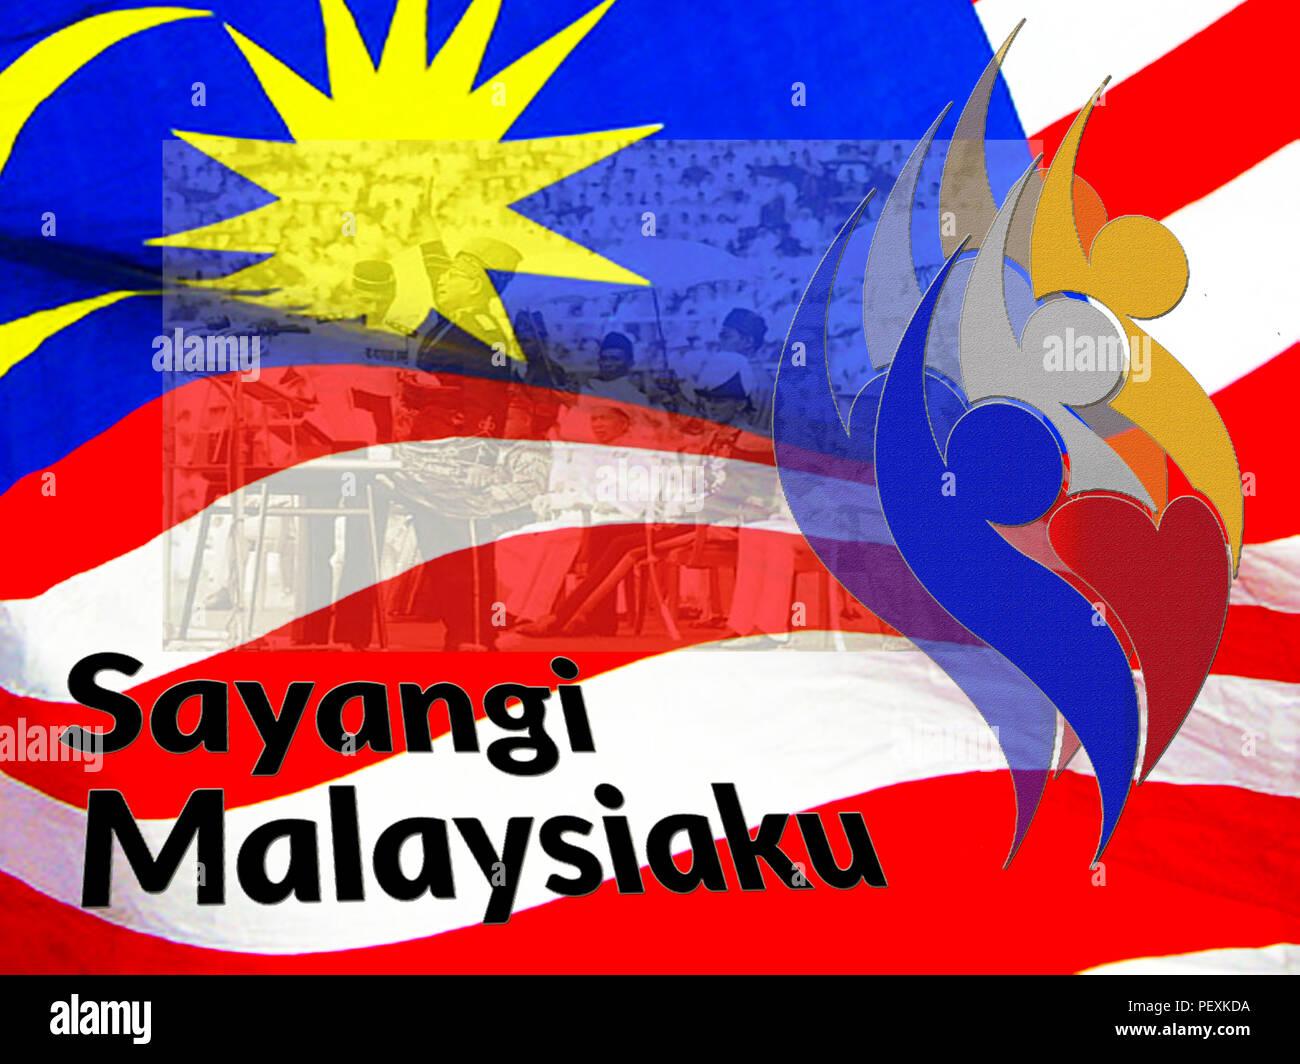 hari merdeka malaysia stock photo alamy https www alamy com hari merdeka malaysia image215715622 html